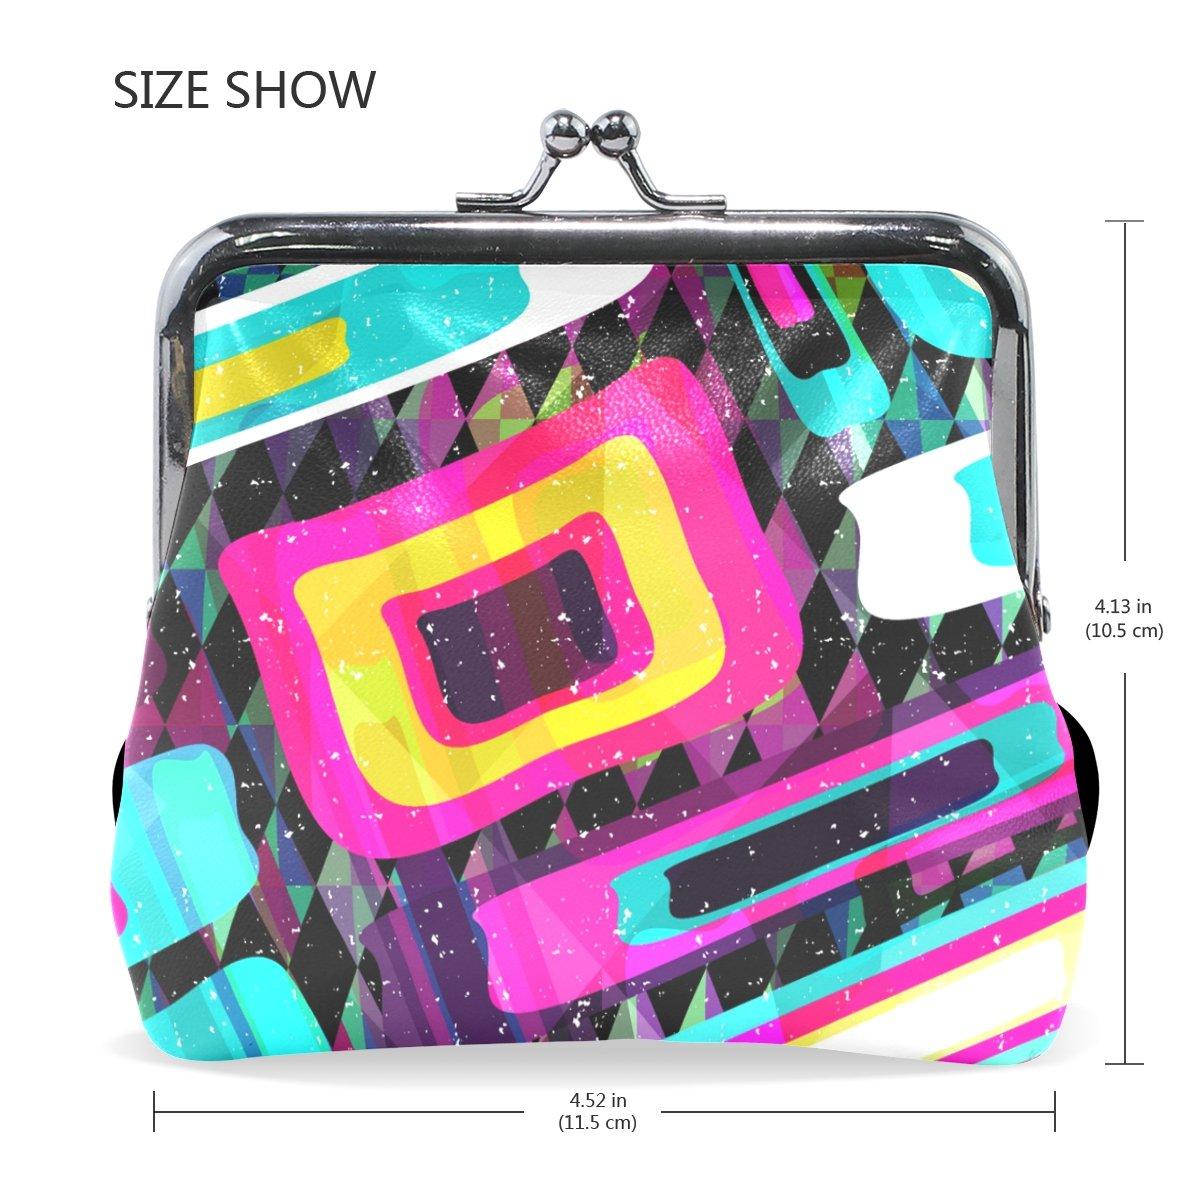 Coin Purse Graffiti Colorful Wallet Buckle Clutch Handbag For Women Girls Gift